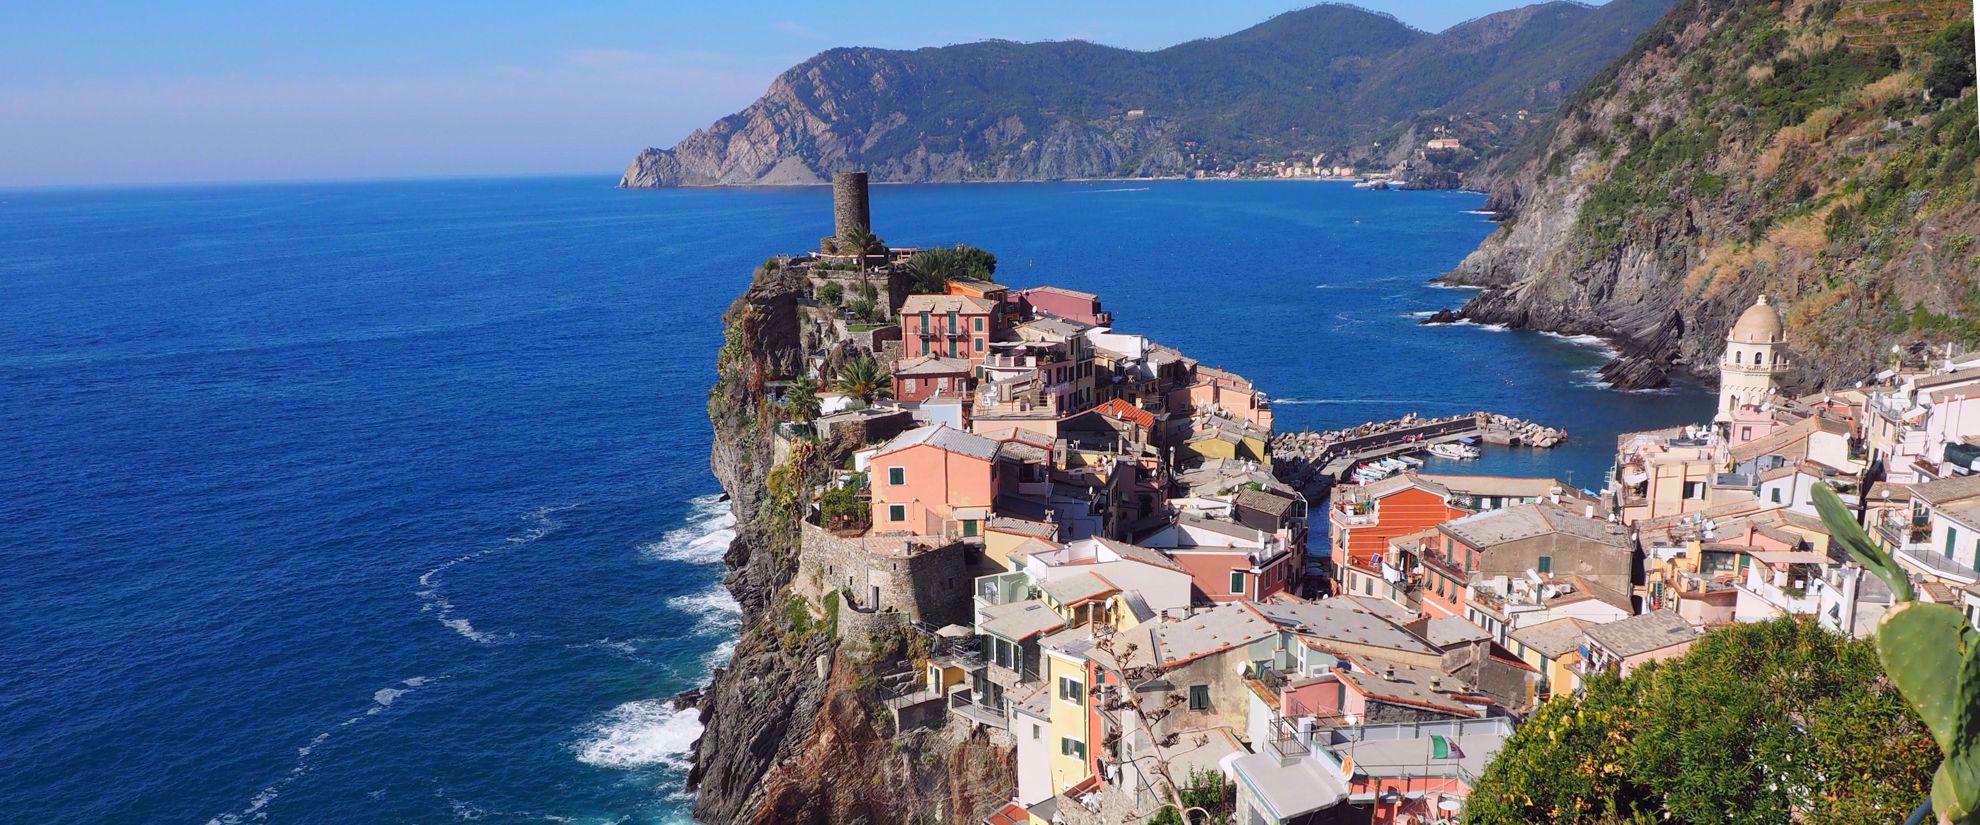 Beautiful landscape of italian riviera